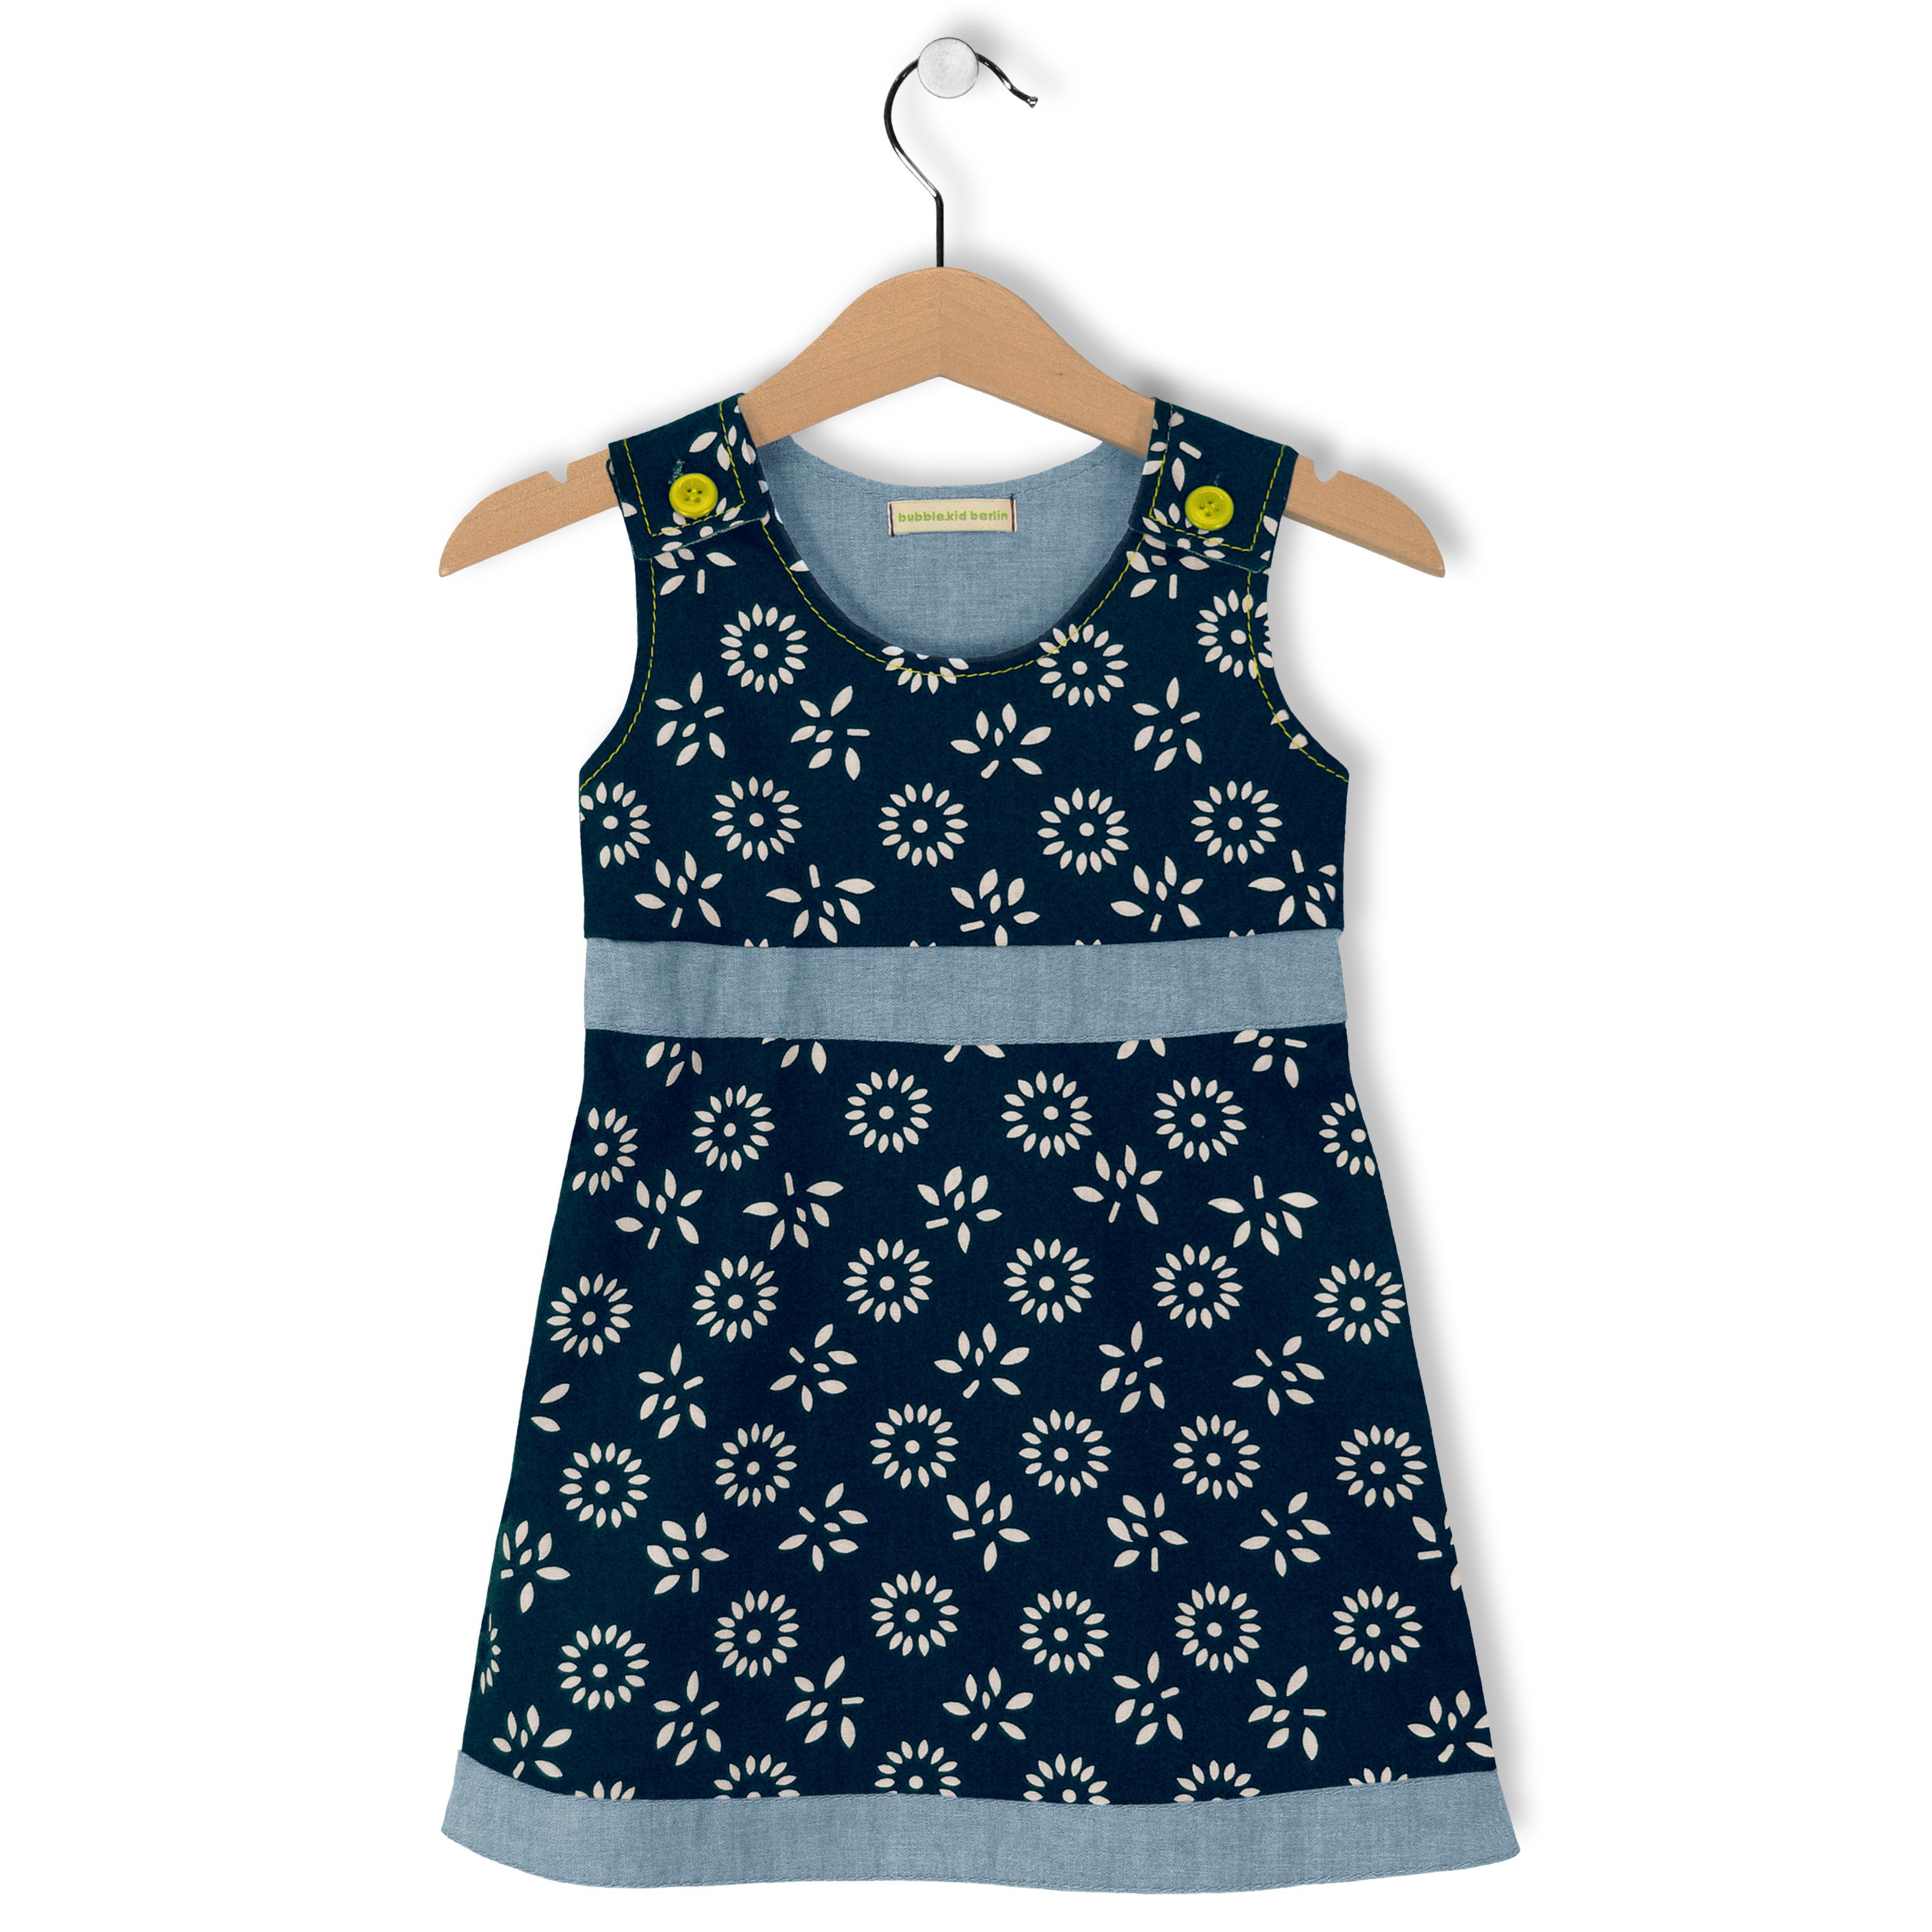 Baby Kleid ANETA - Baumwolltuch dunkelblau/weiss - bubble.kid berlin